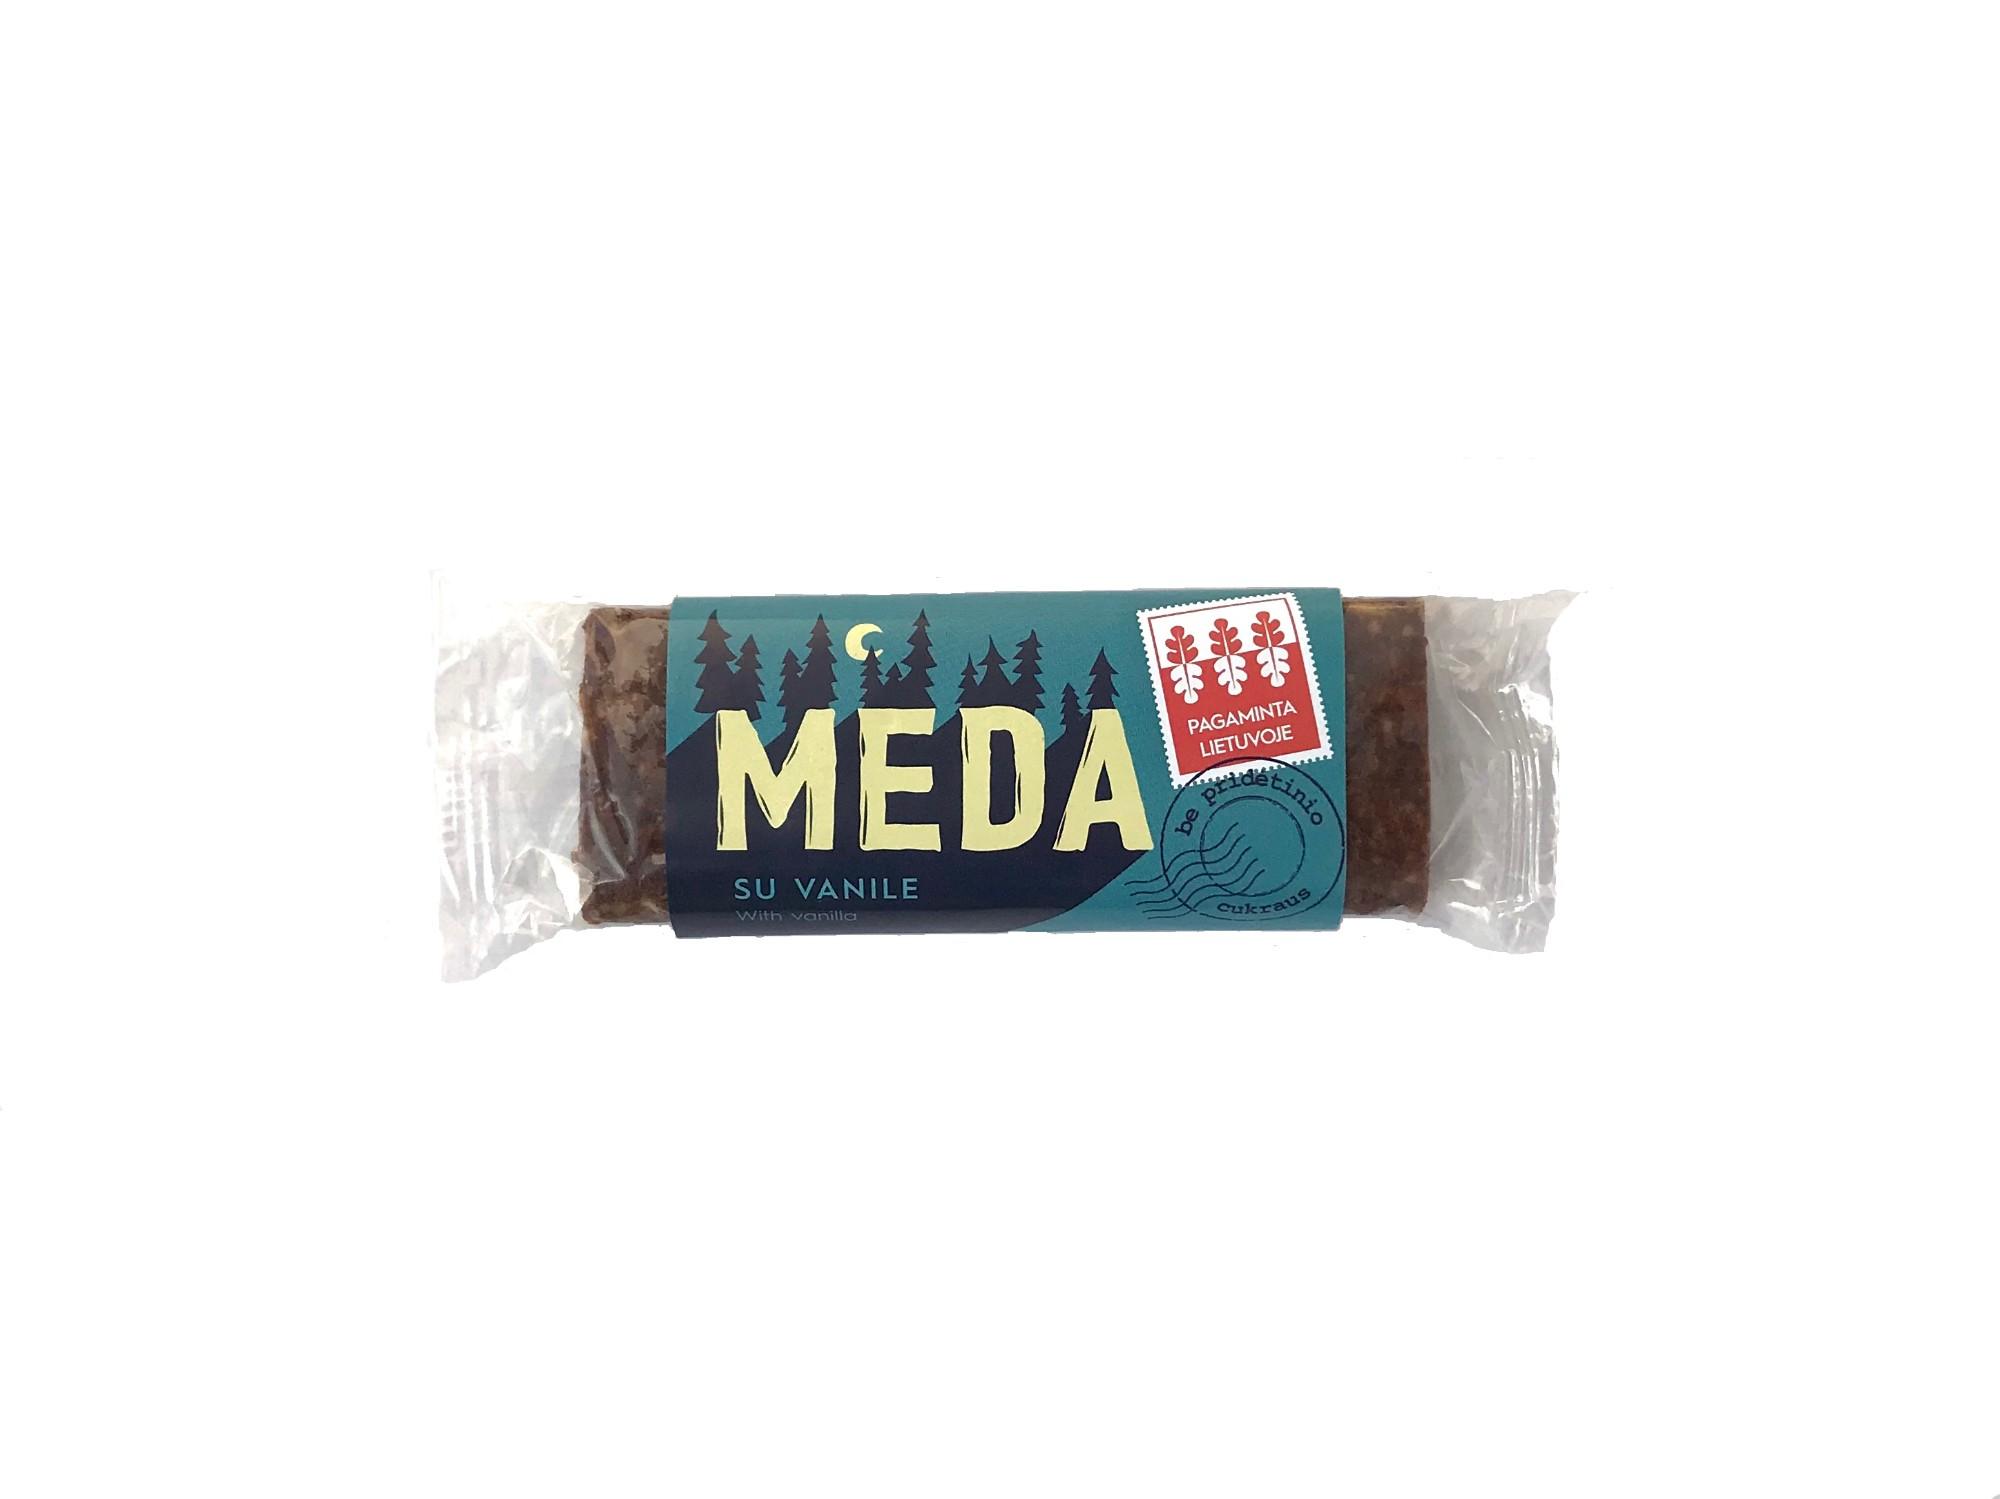 Energinis batonėlis MEDA su vanile, 50g